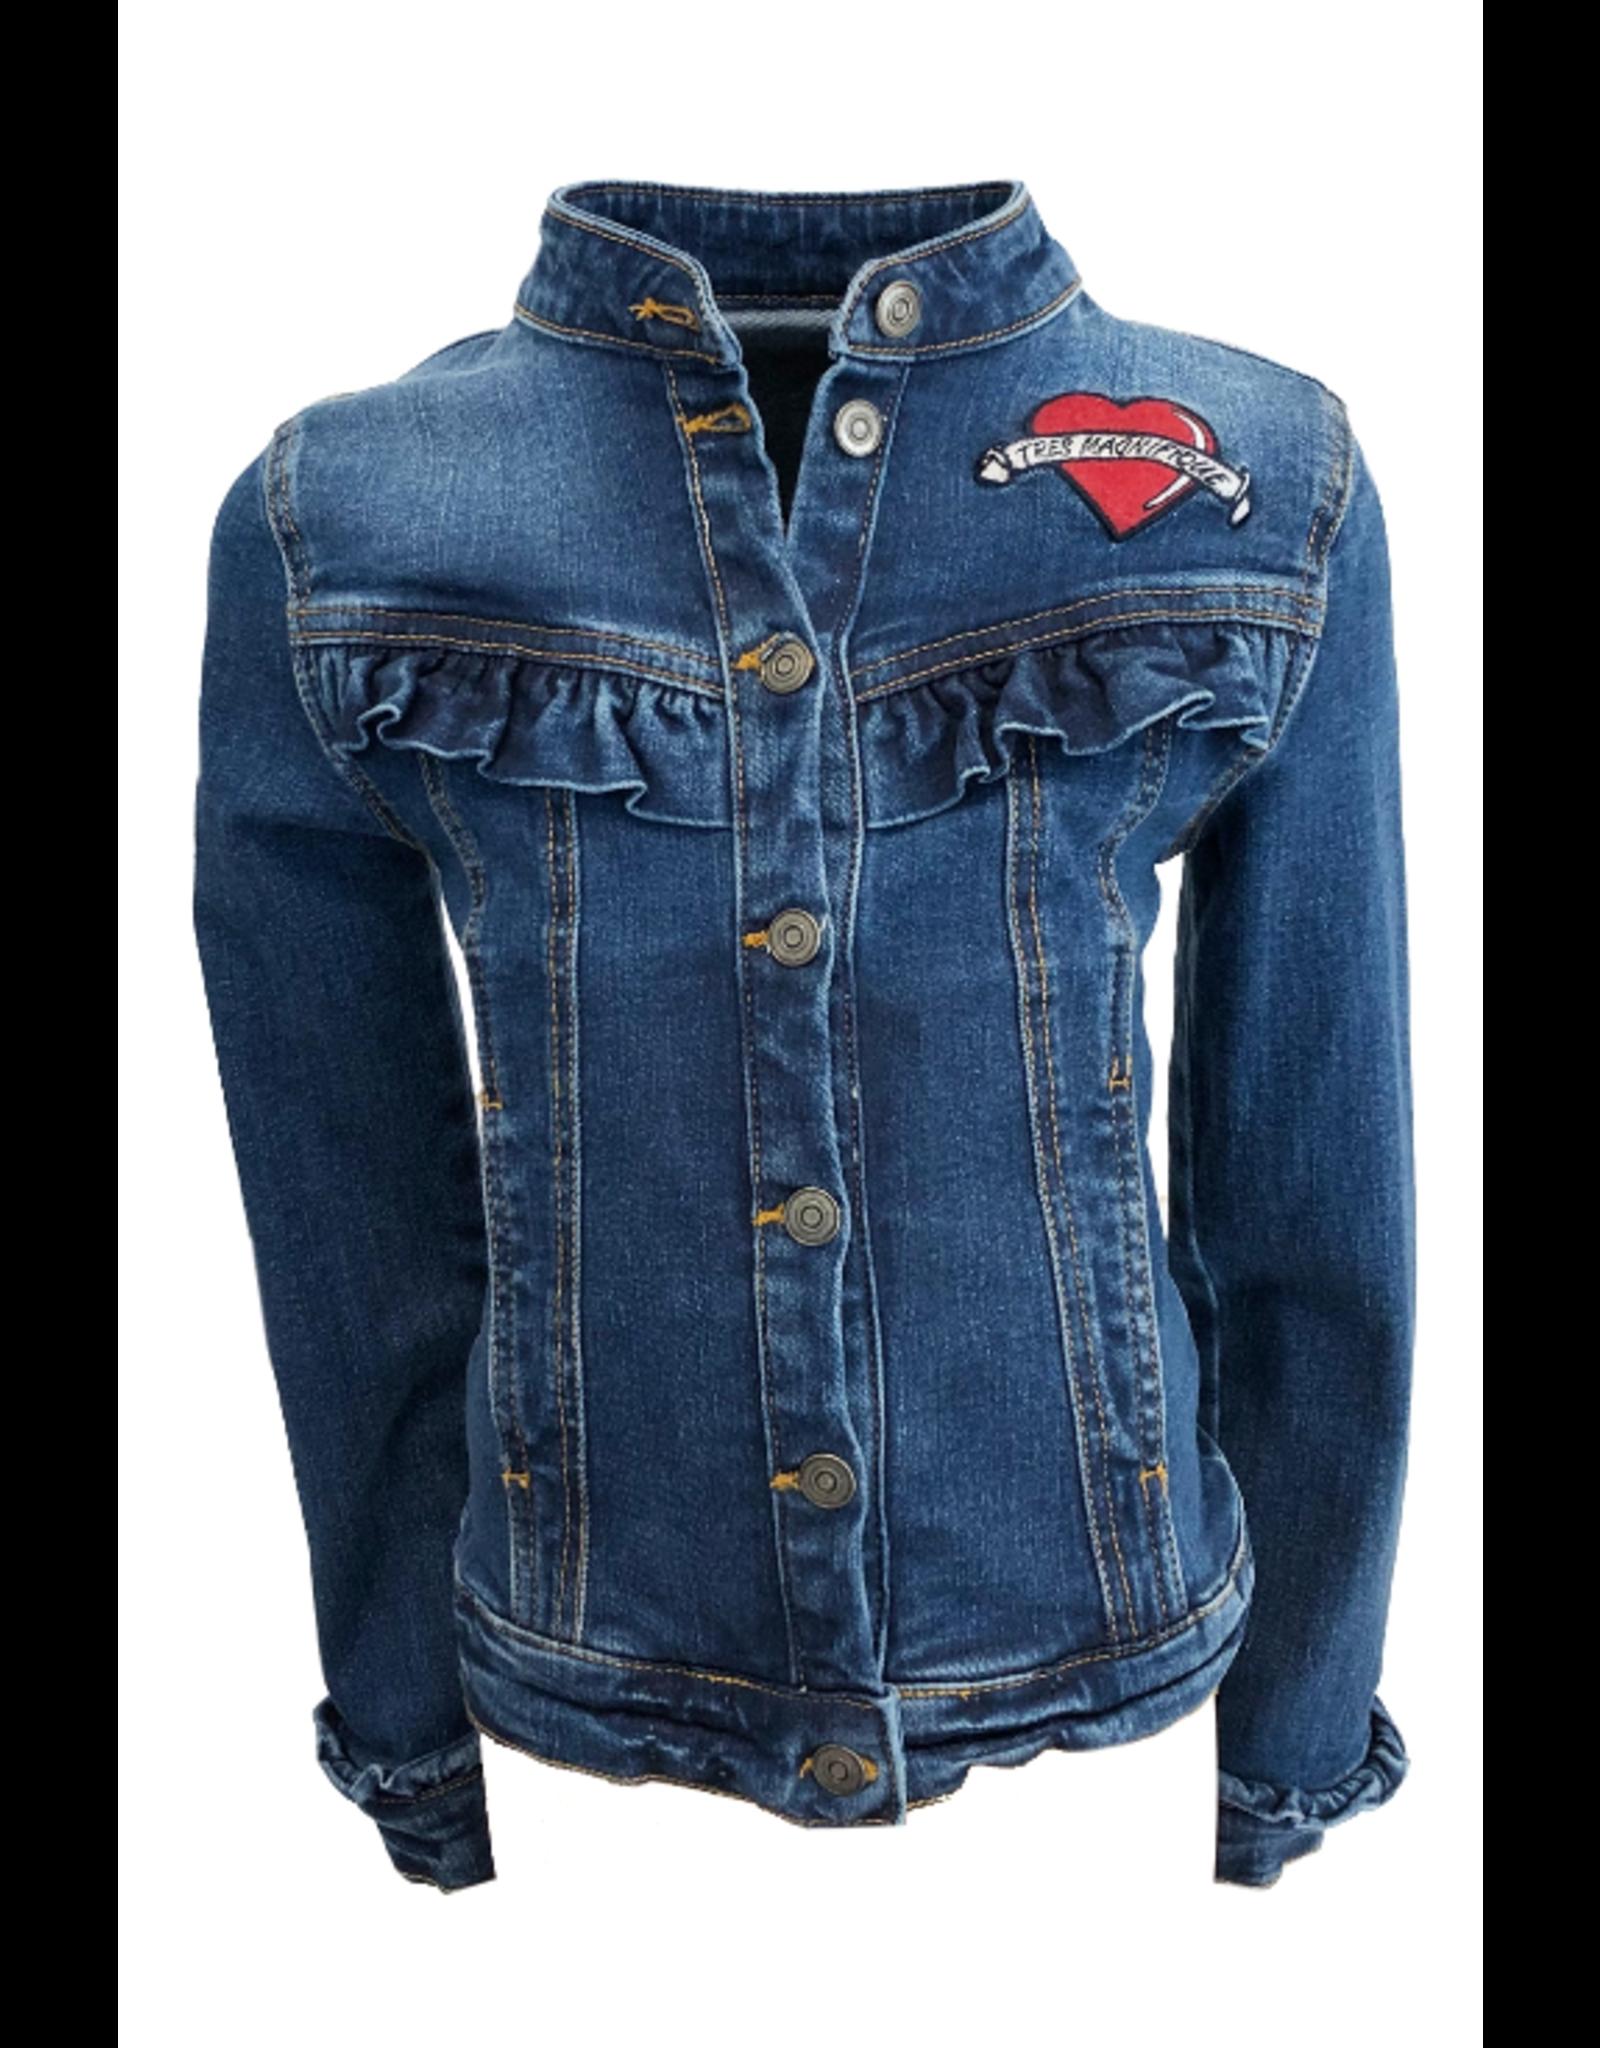 Topitm Jacket Isa Jeans